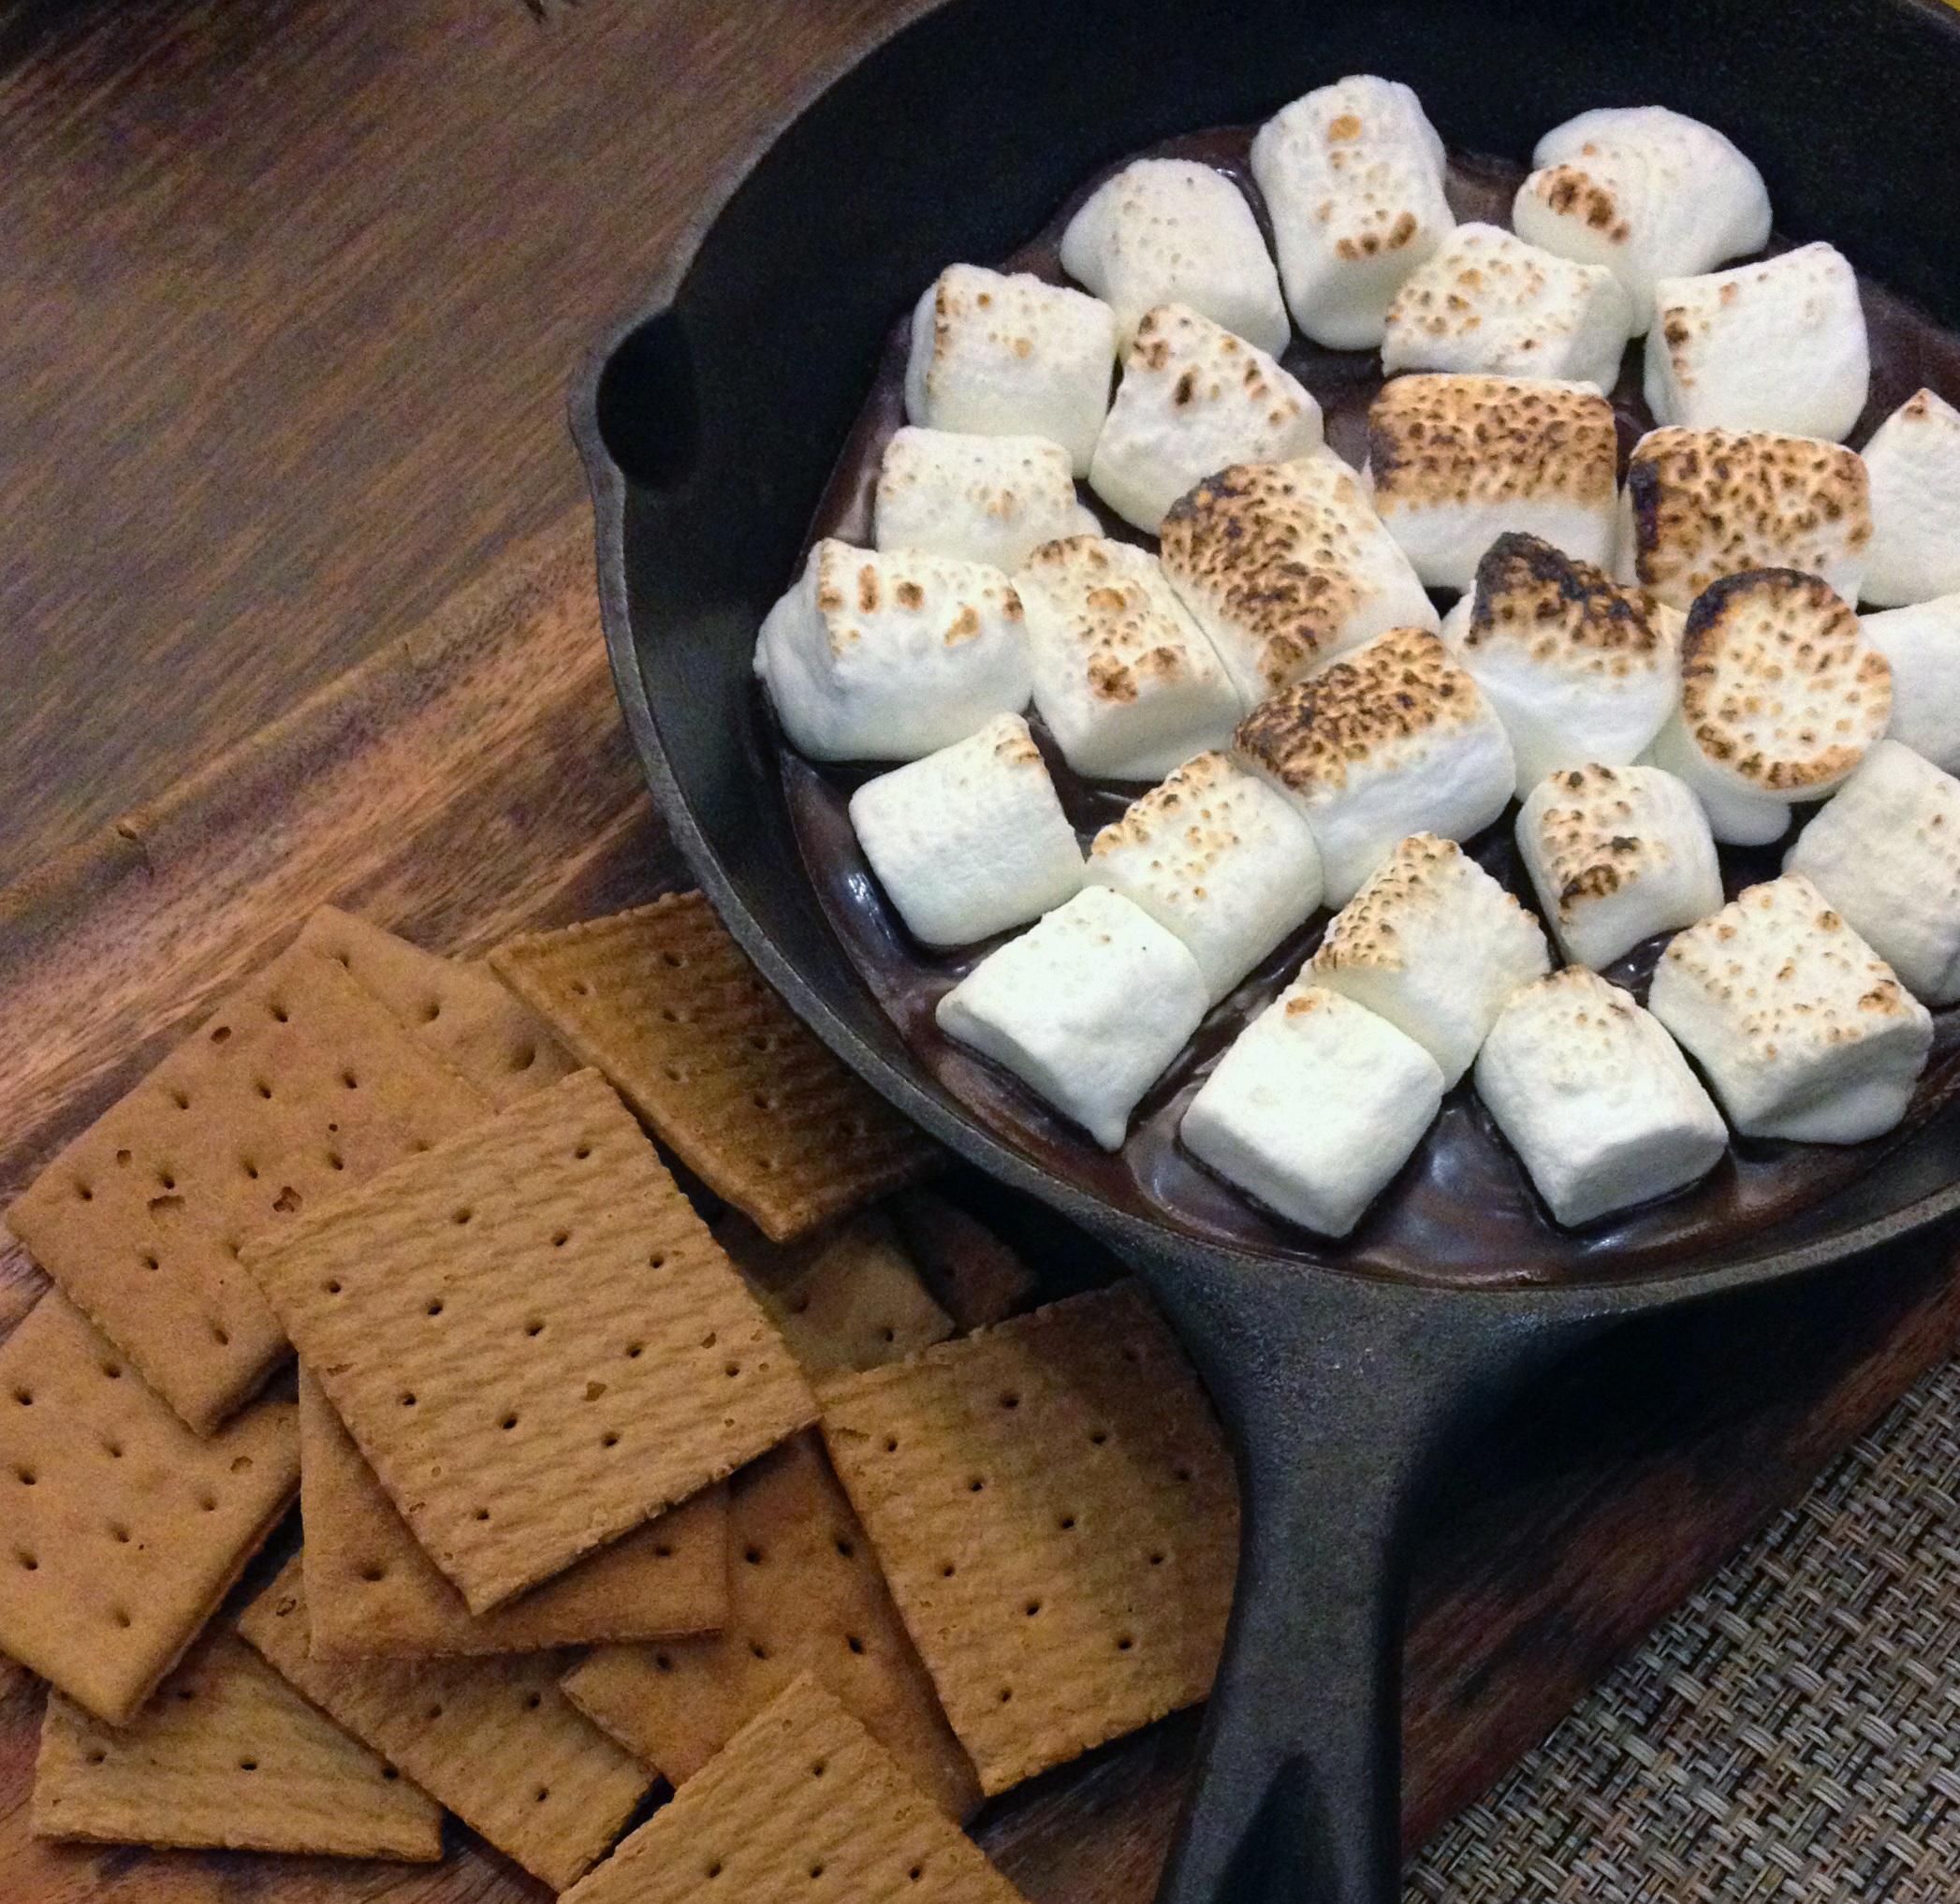 smores-food-dessert-sweet-162970